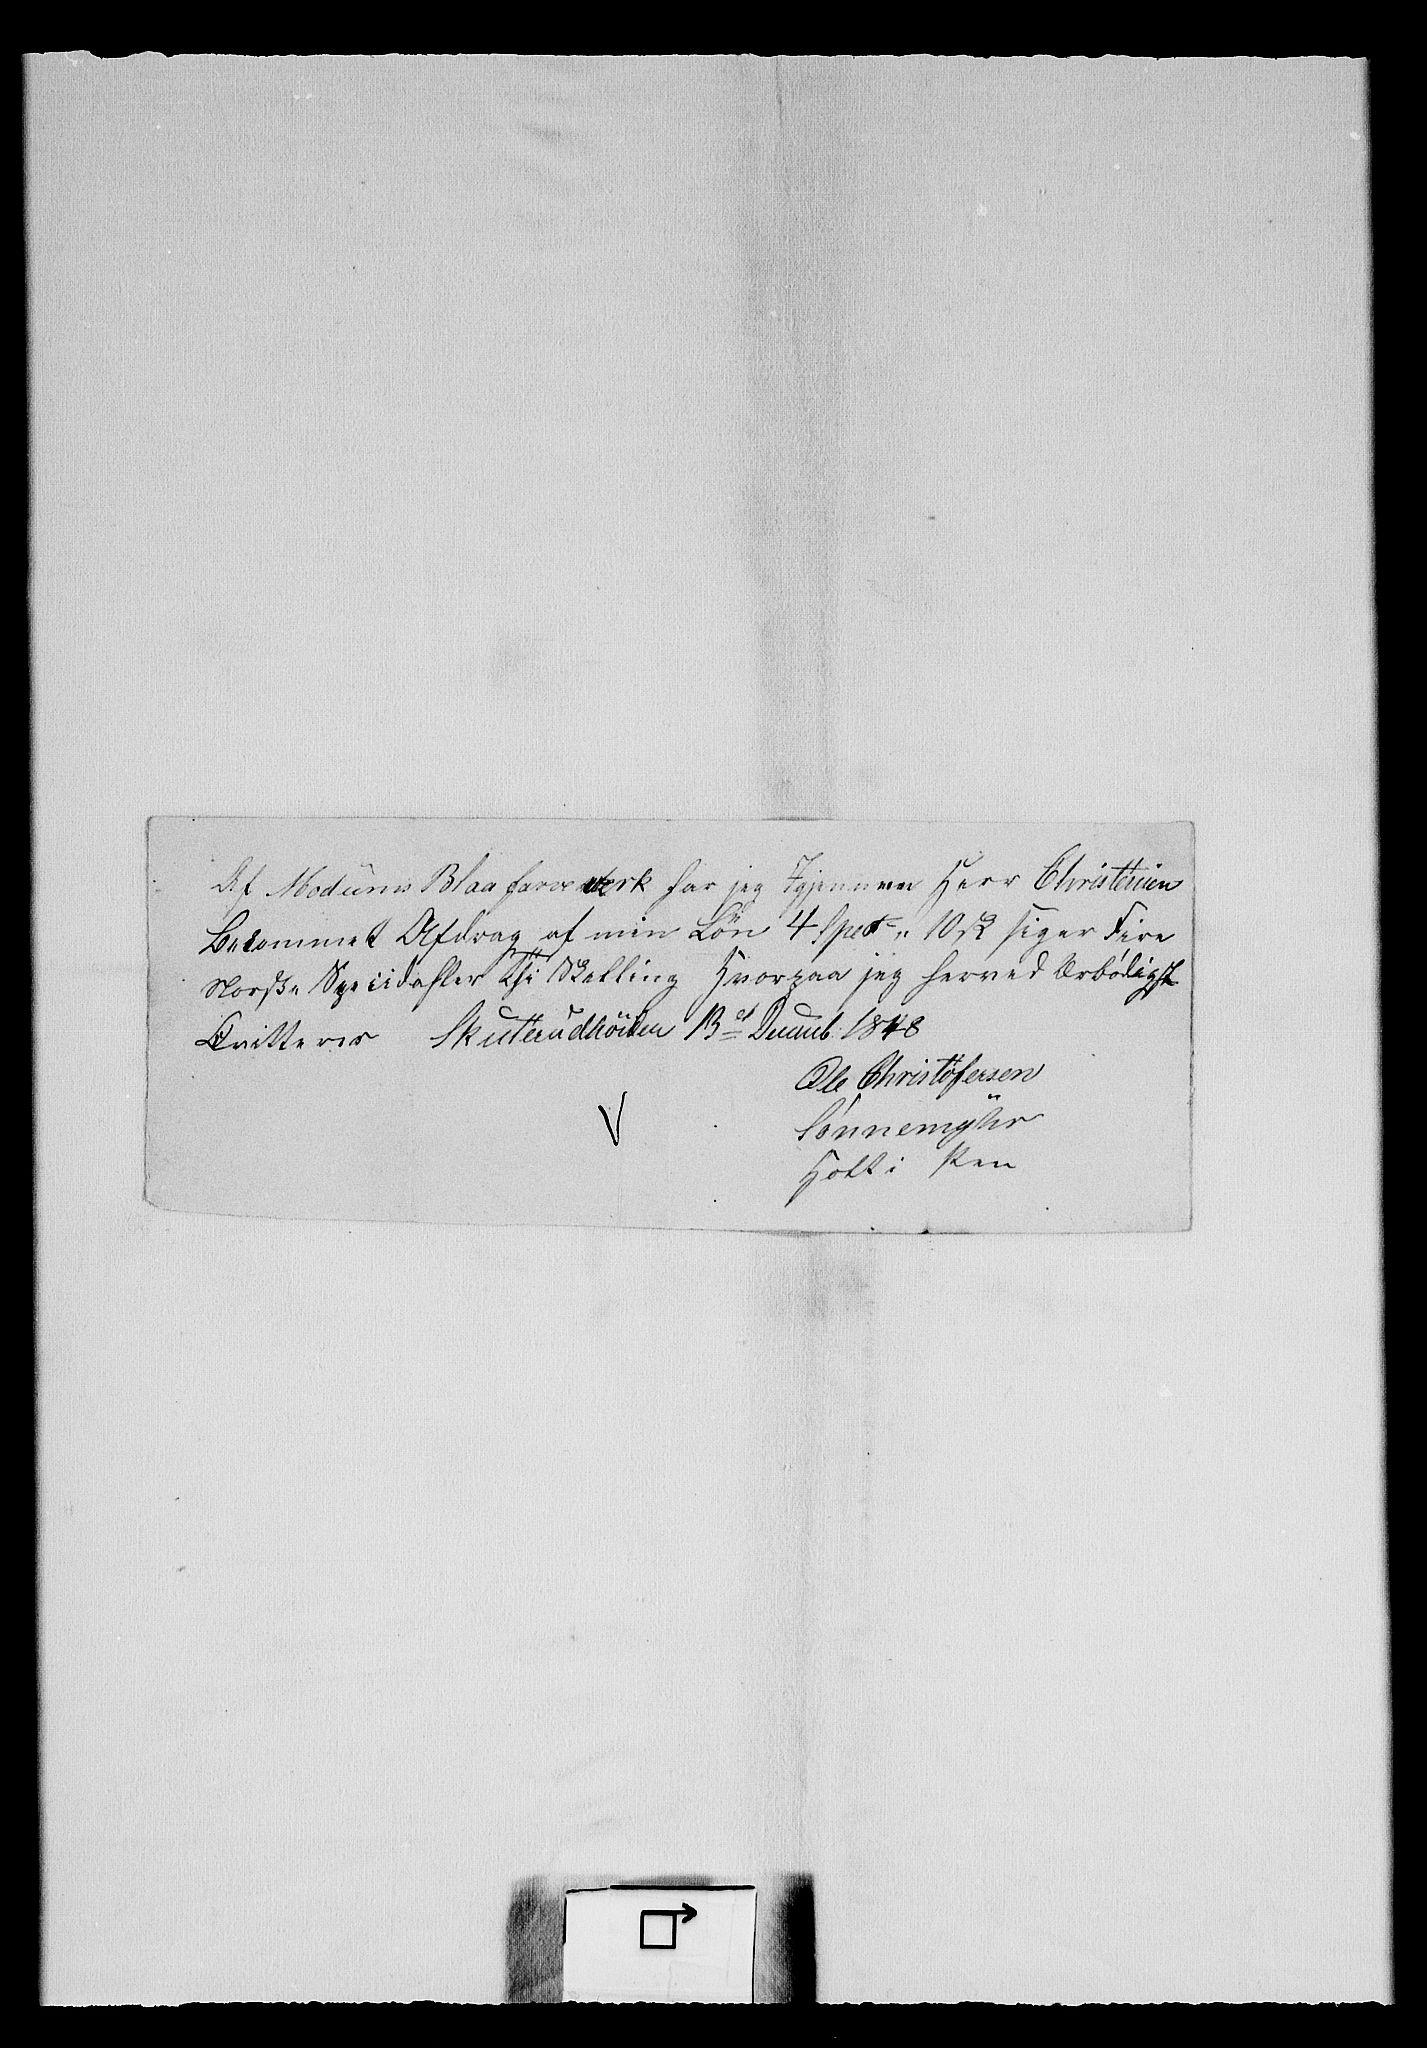 RA, Modums Blaafarveværk, G/Gd/Gdc/L0243, 1846-1849, s. 2